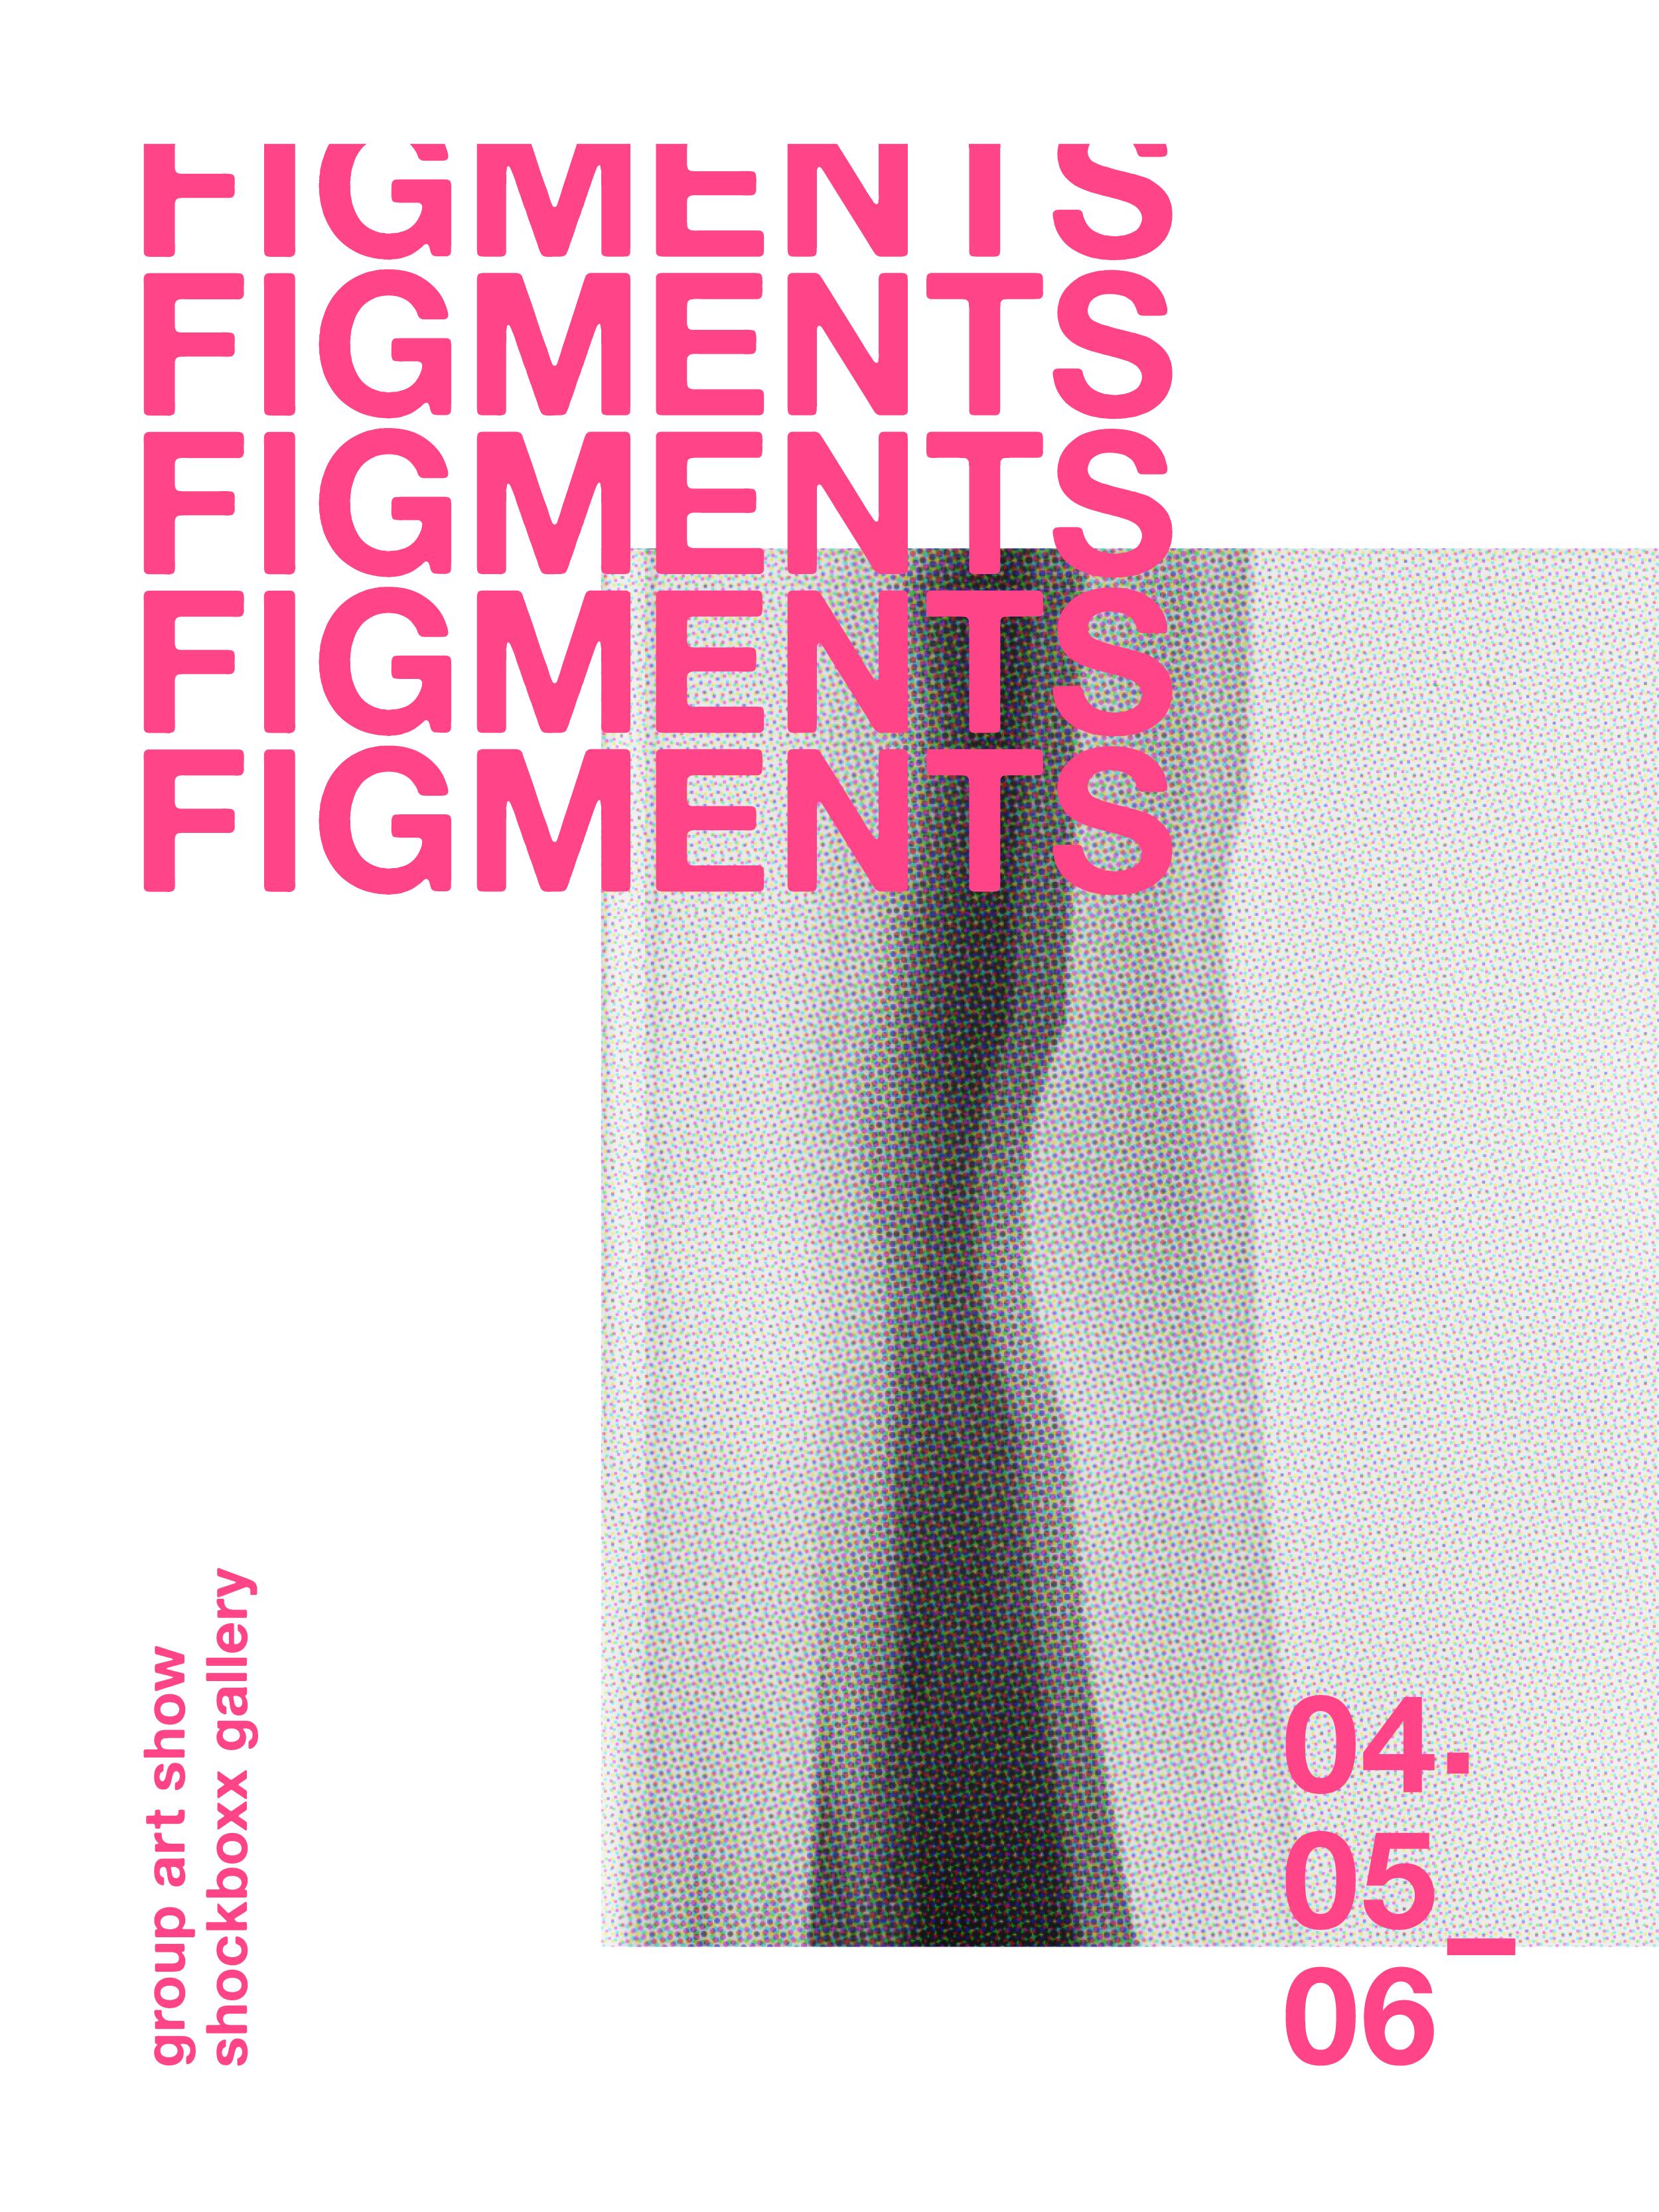 figments_promo_portrait.jpg